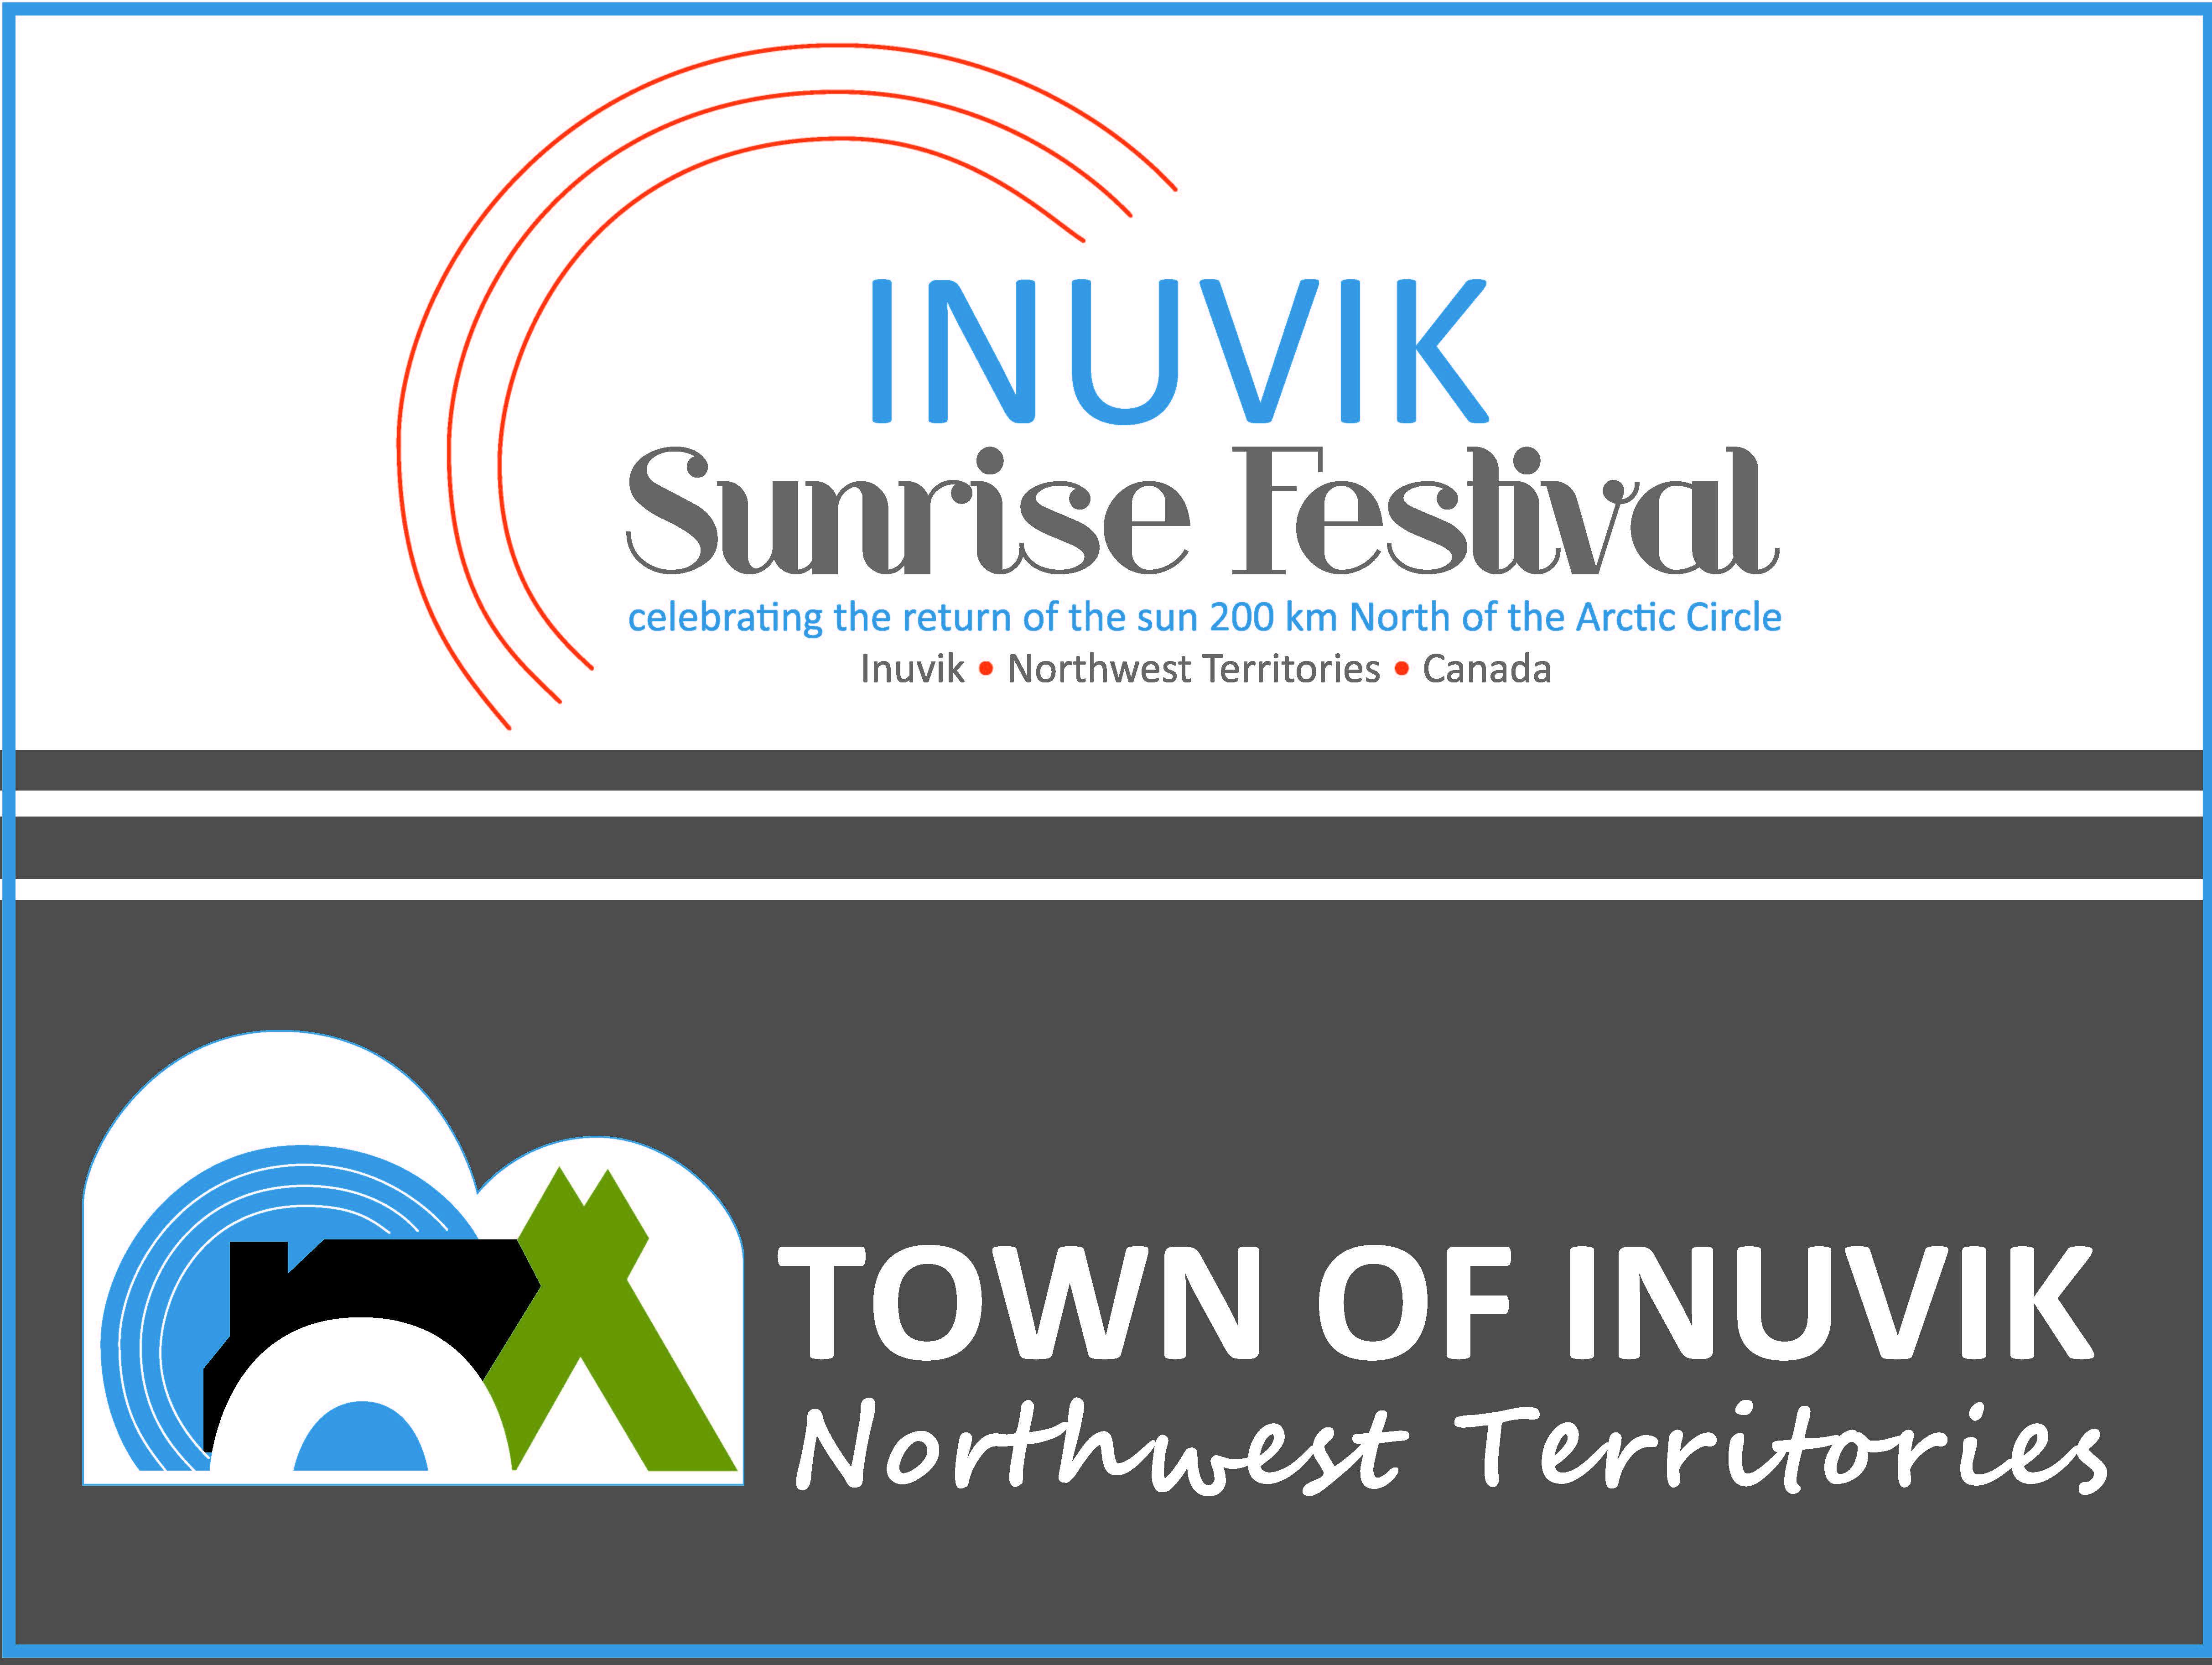 2019 Inuvik Sunrise Festival